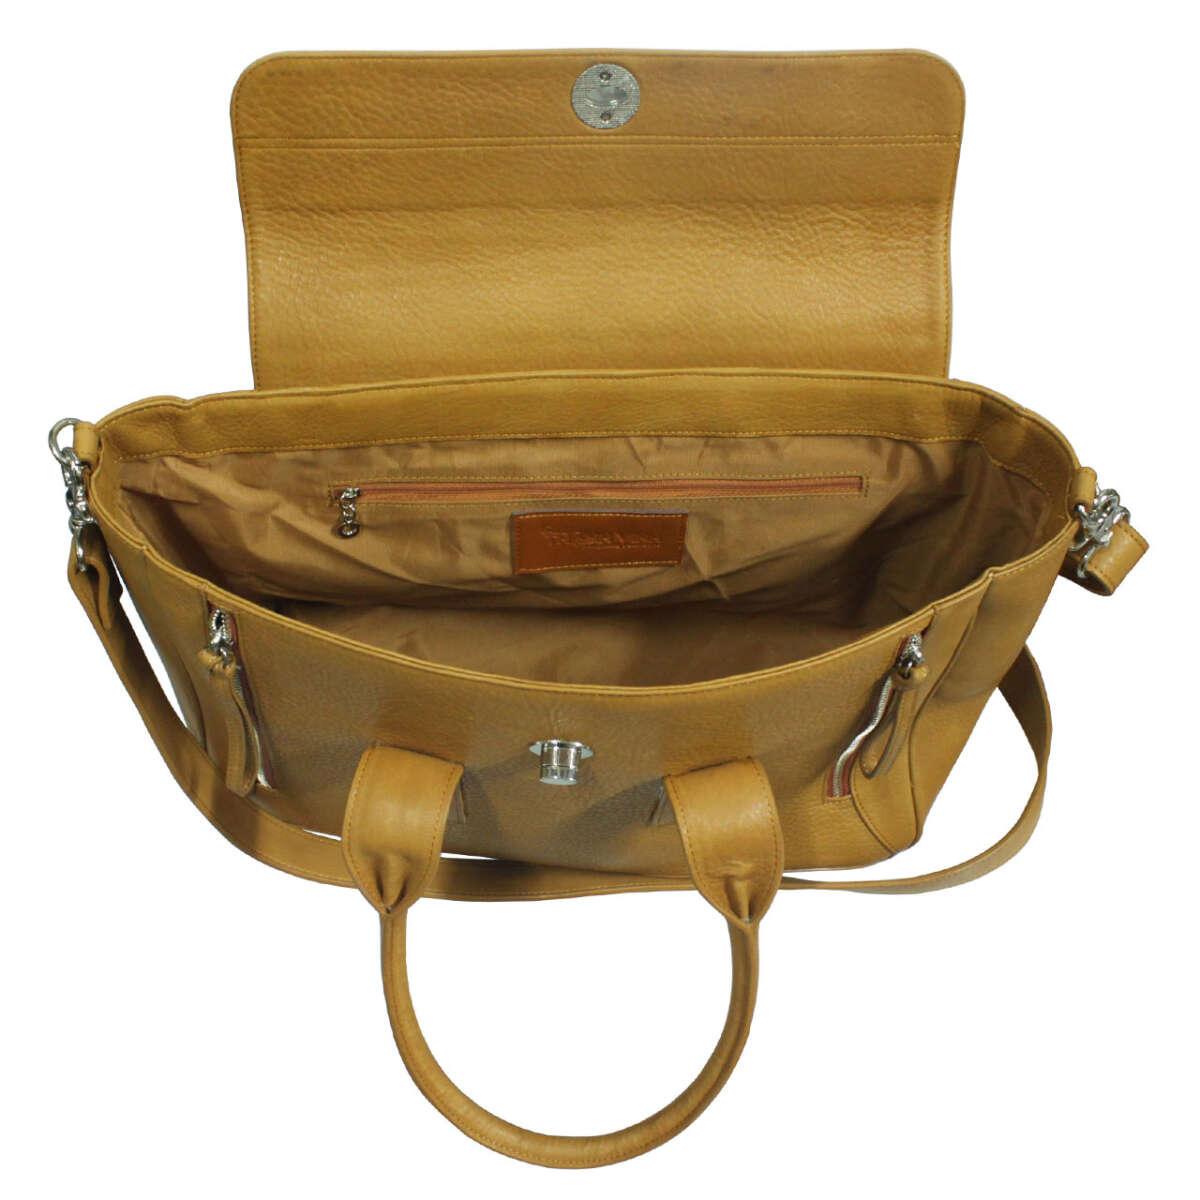 Túi xách nữ da bò B015b